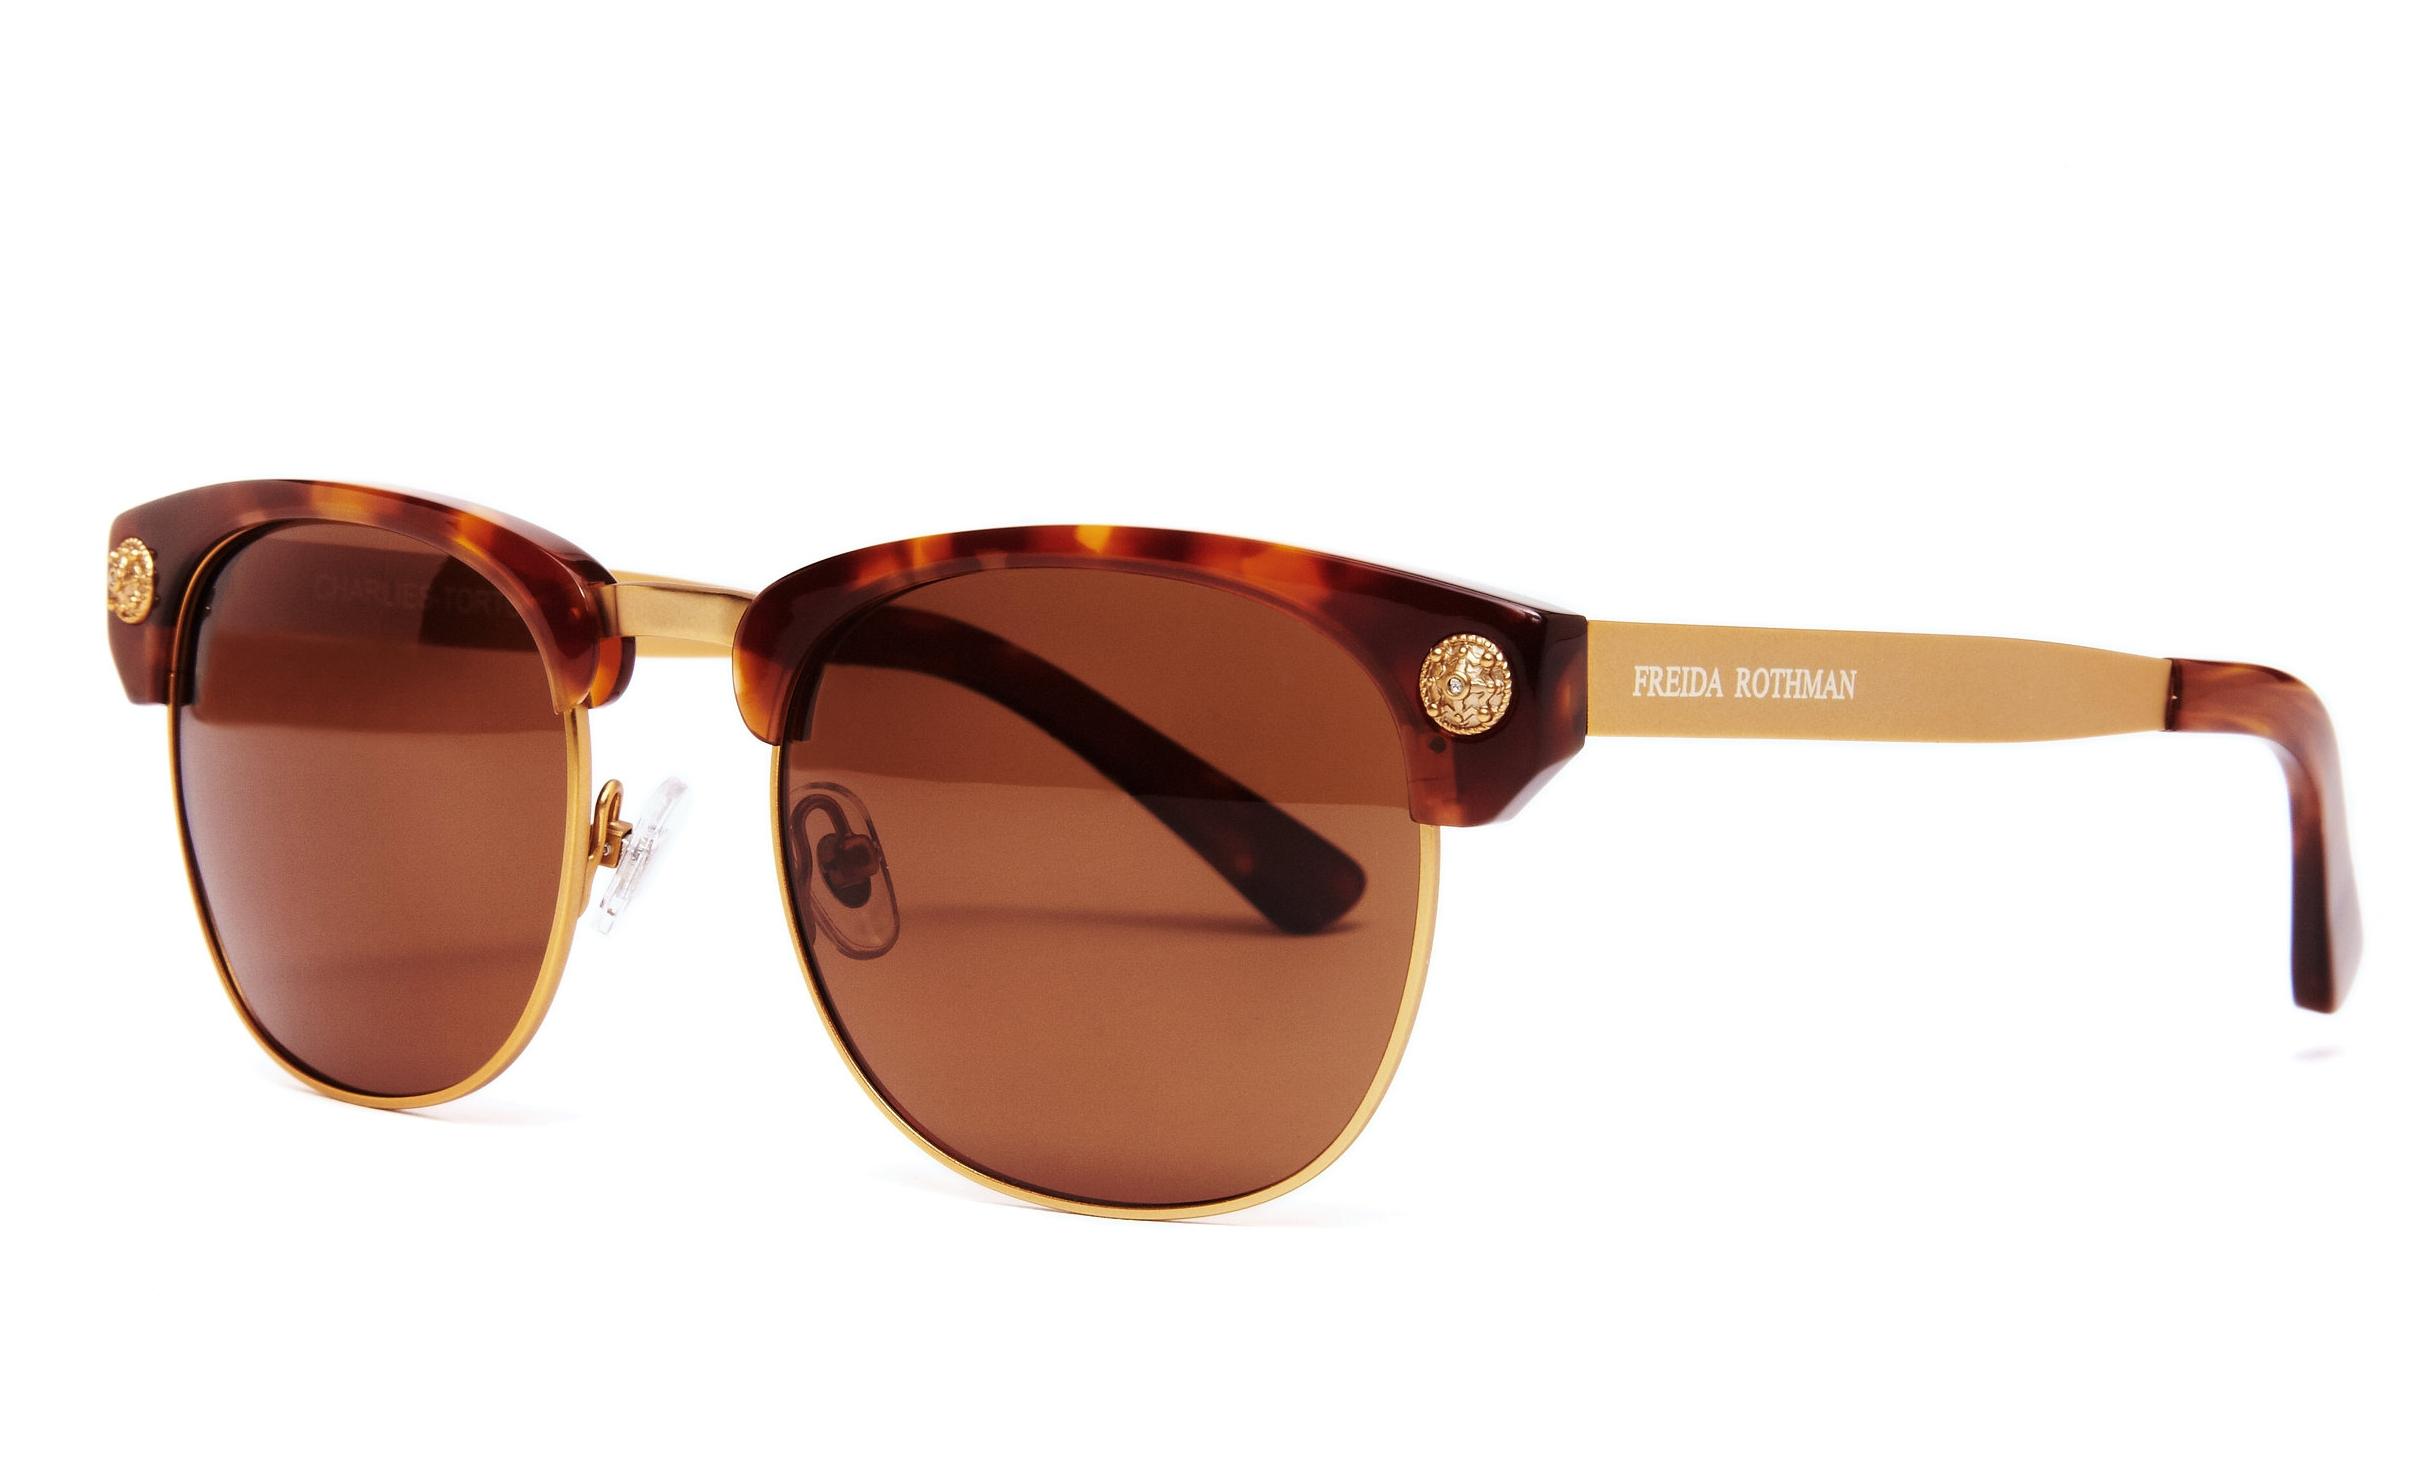 Sunglasses-2_0001.jpg